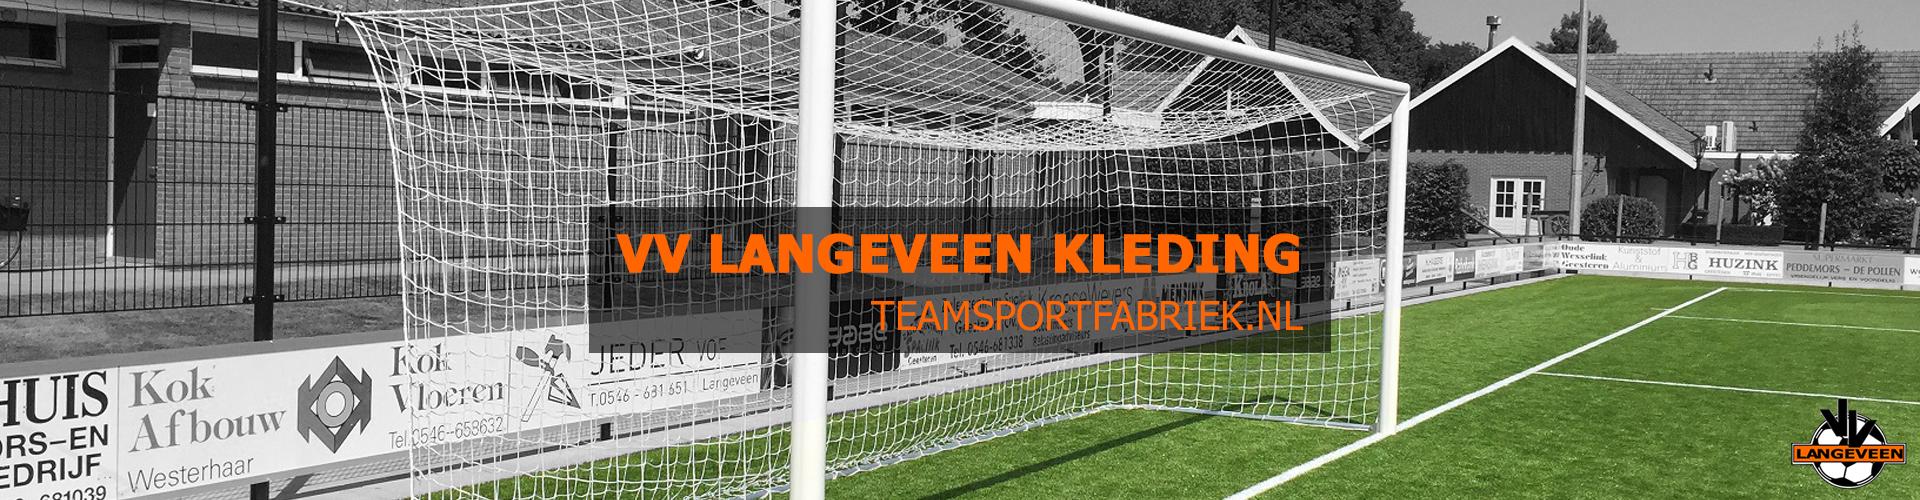 Voetbalvereniging Langeveen